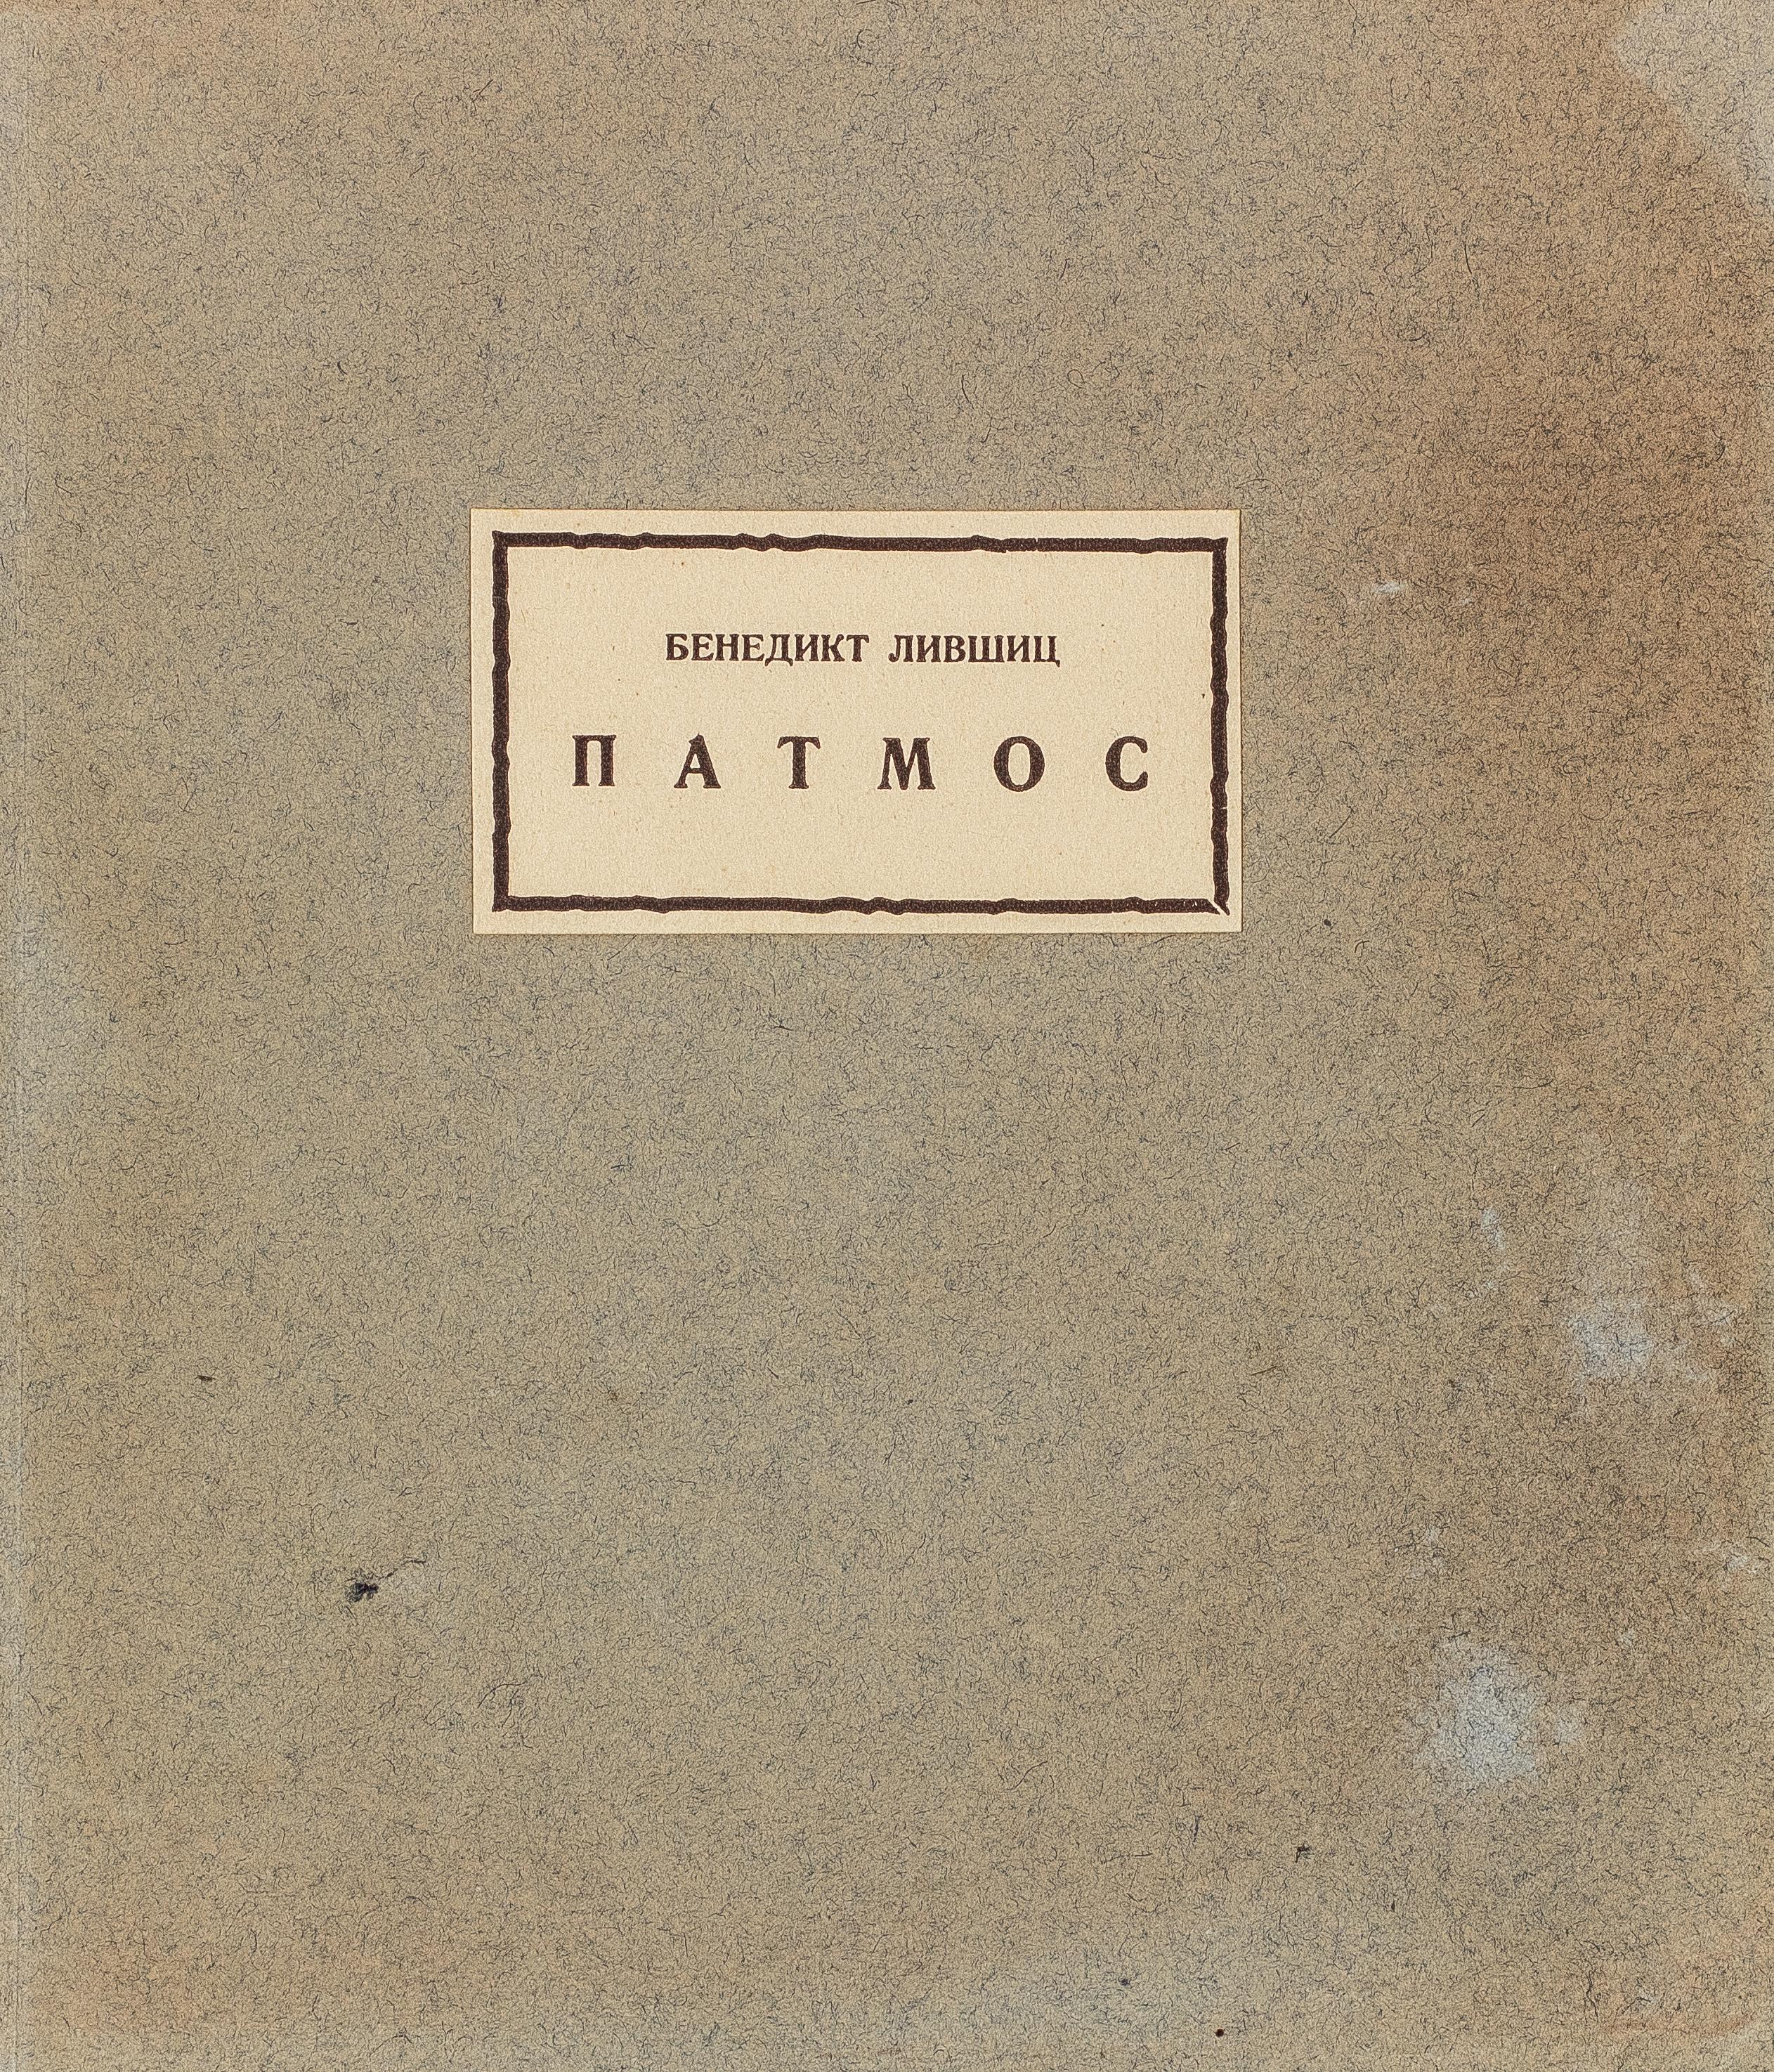 Lot 421 - LIWSCHUTZ (LIVCHITS), Benedict. Patmos. Poèmes. Moscou, Ouzel, 1928. 12°, [...]